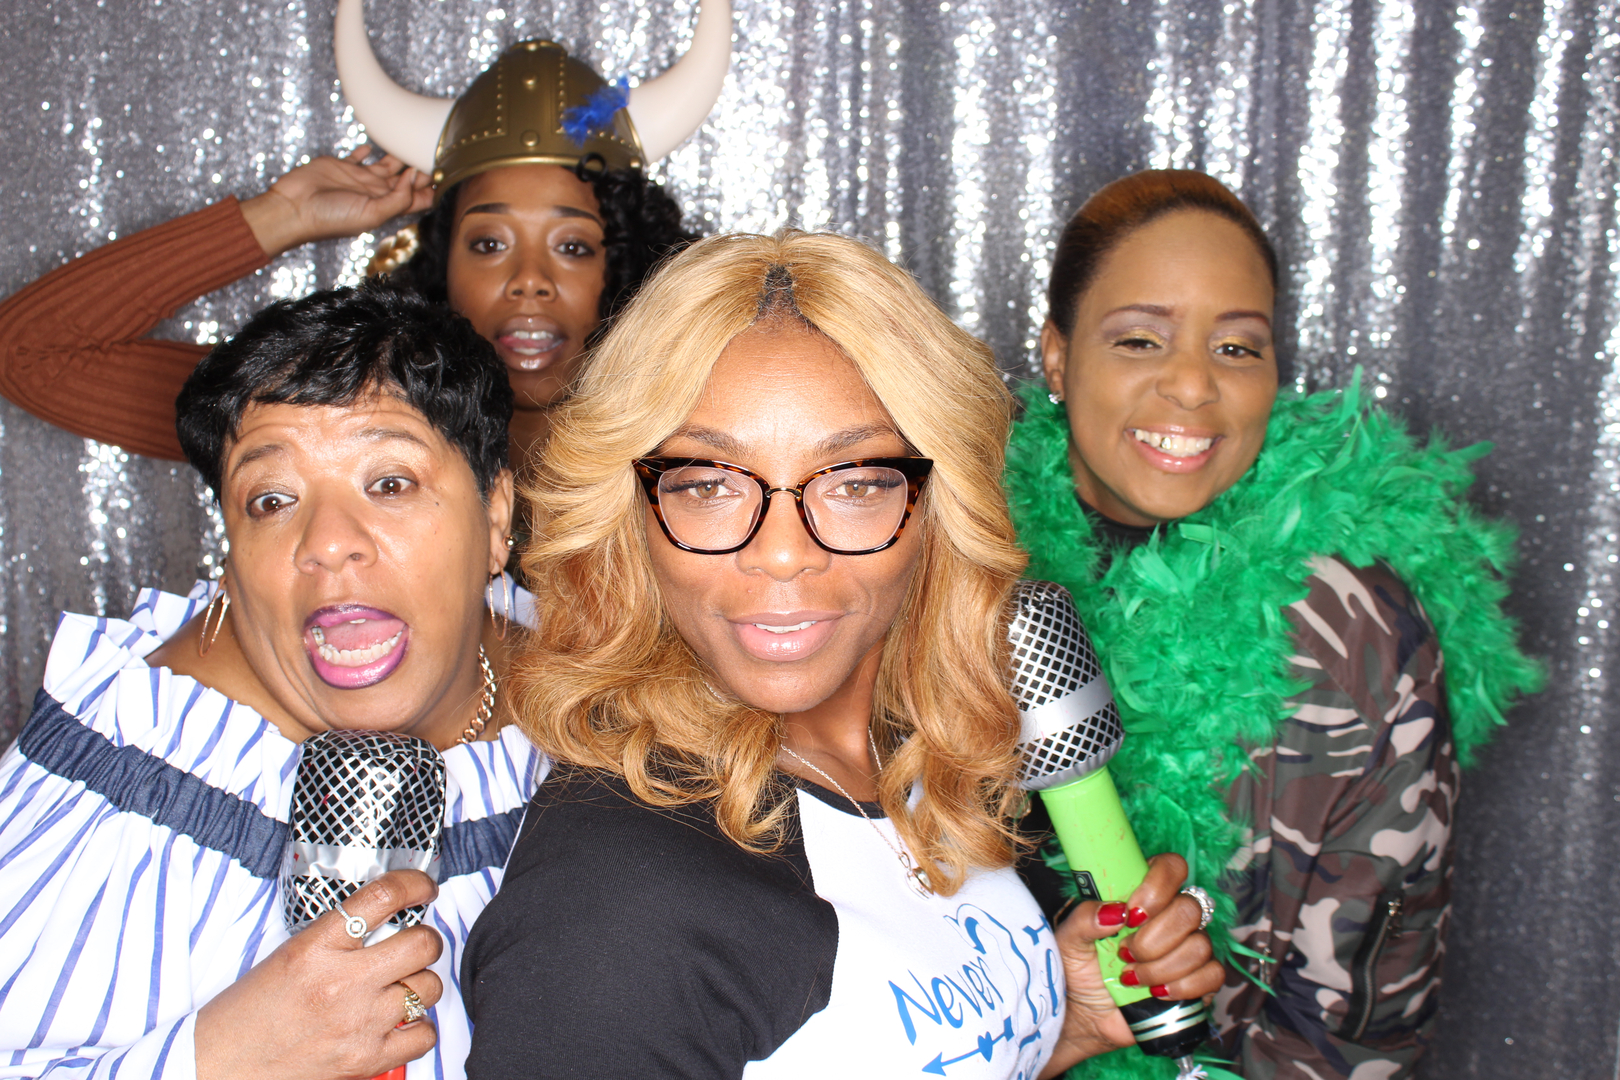 Atlanta Photo Booth Rental for Weddings, Proms, Sweet 16s